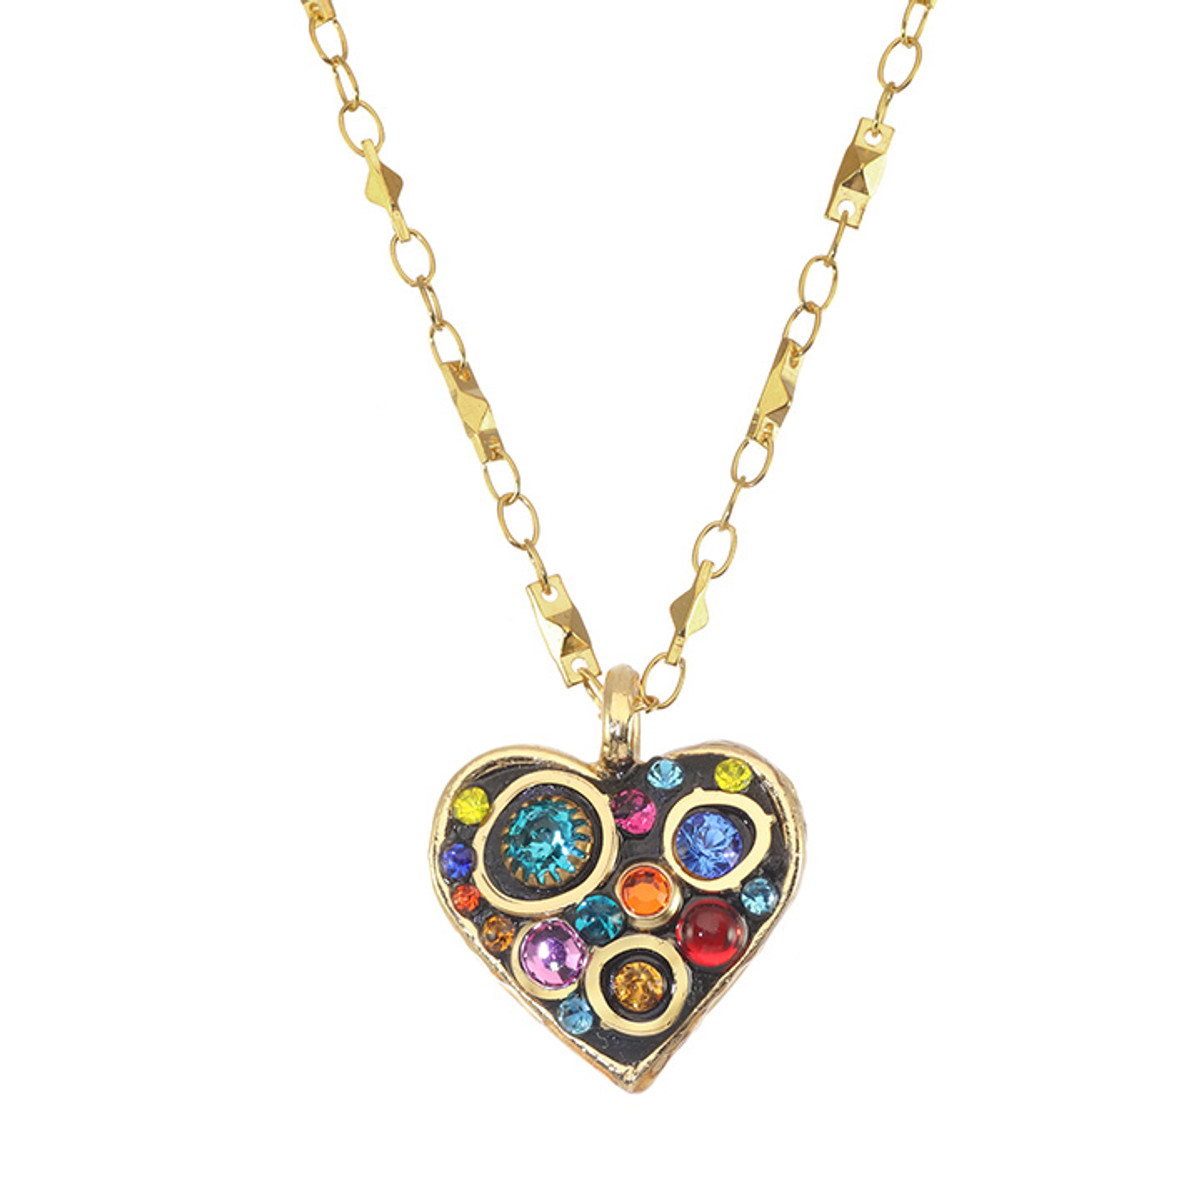 Michal Golan Michal Golan Cosmic Heart Necklace